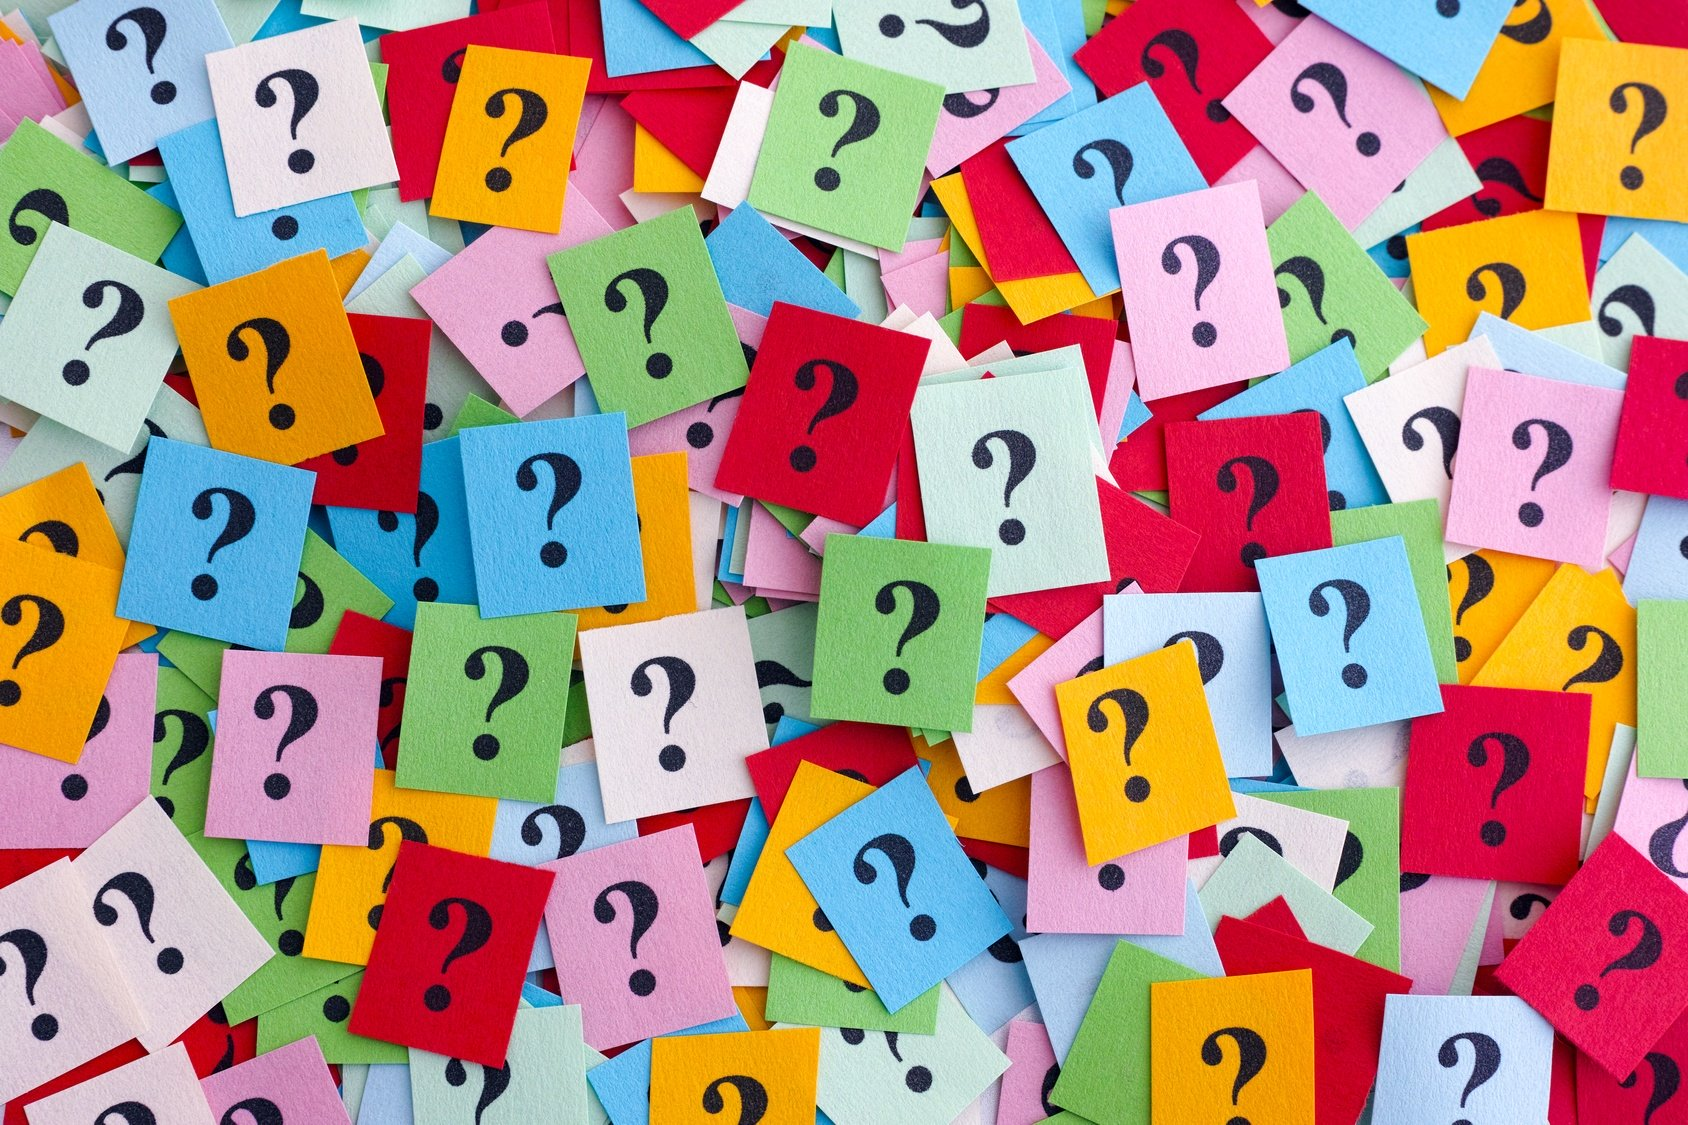 creative_college_essay_questions.jpg